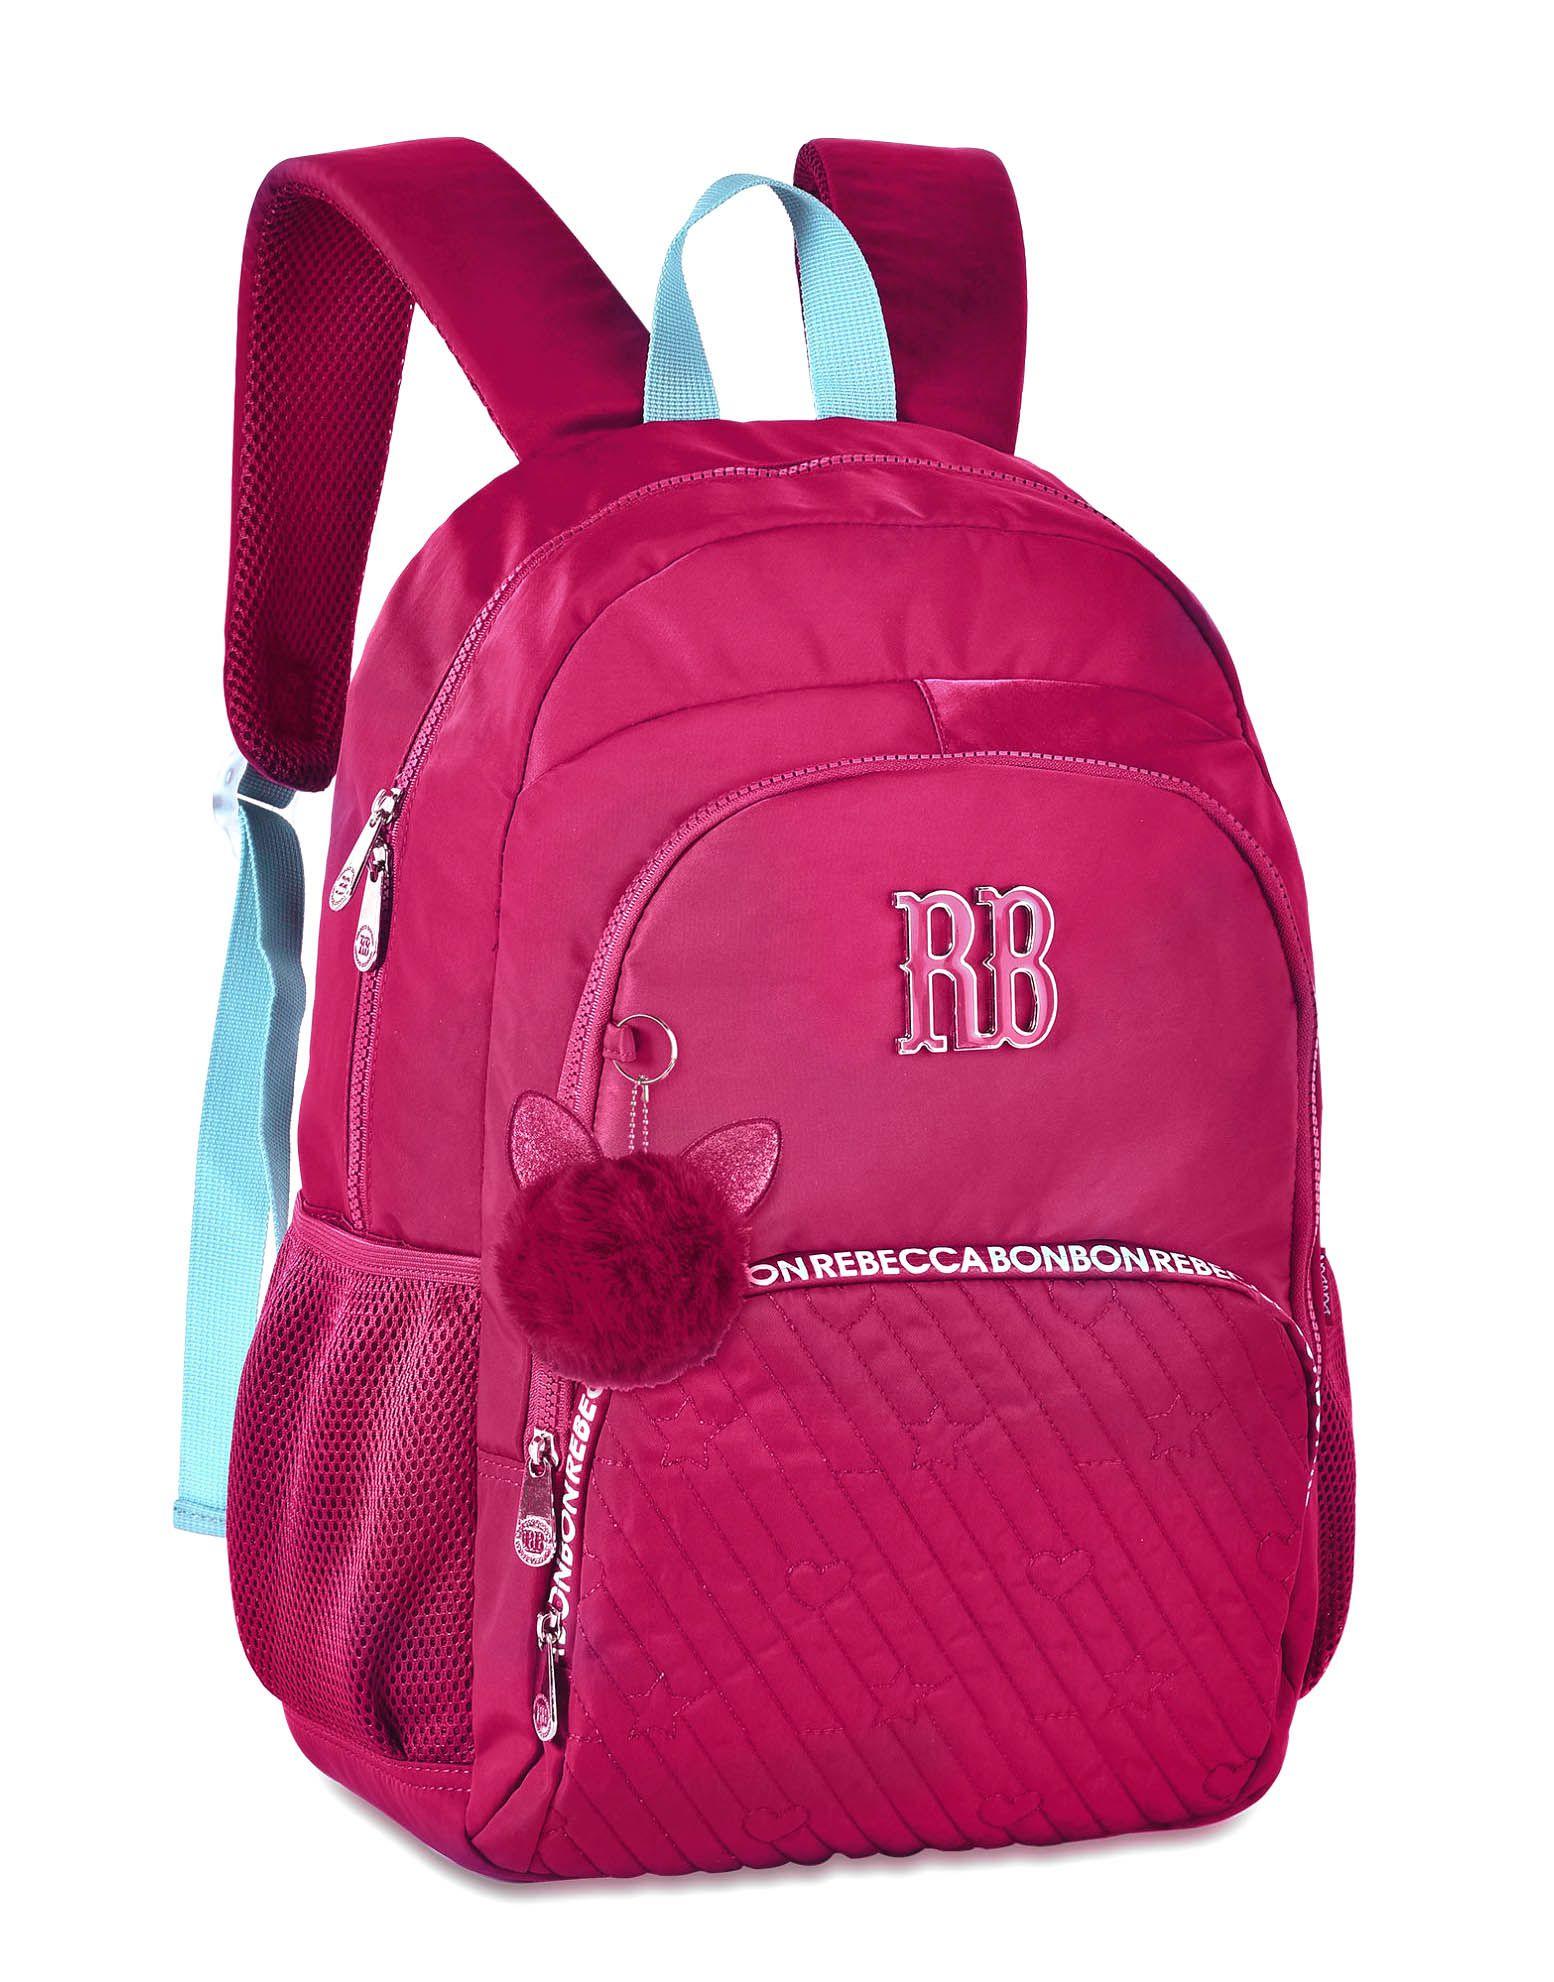 Mochila Escolar Universitária Rebecca Bonbon RB2060 Rosa